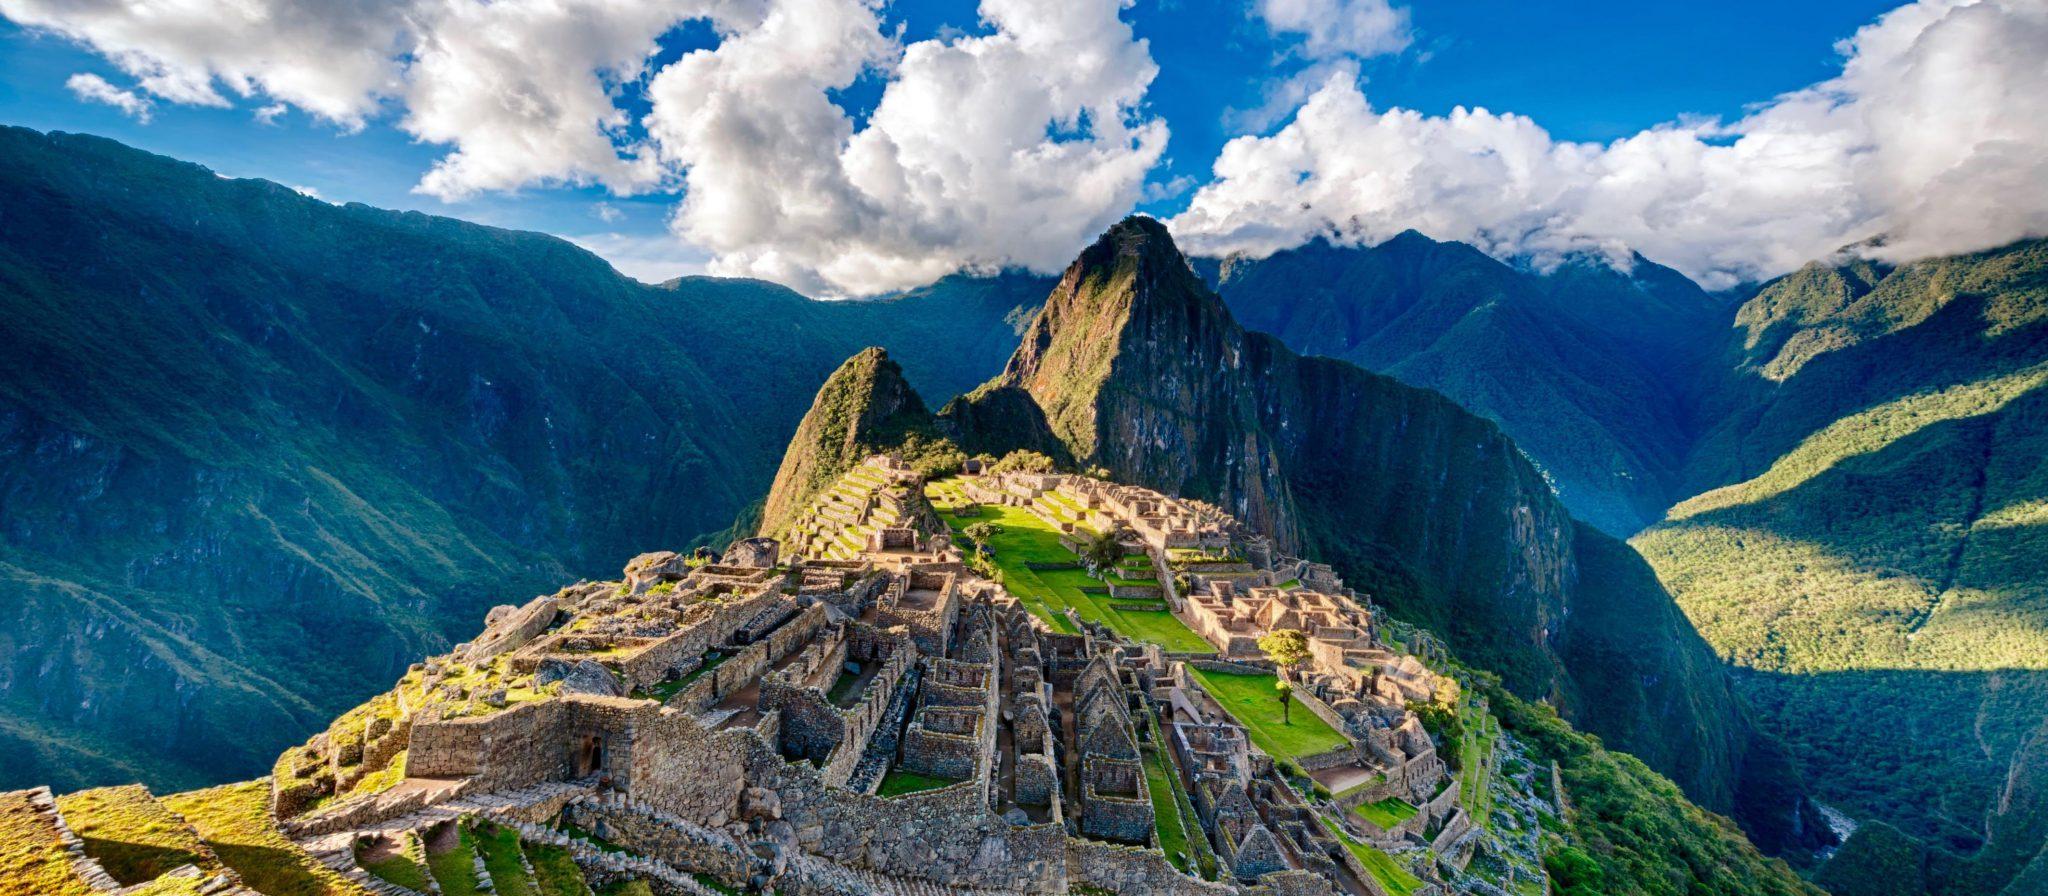 Machu Picchu Tours >> Machu Picchu Tours Trip Packages For Machu Picchu Pie Experiences